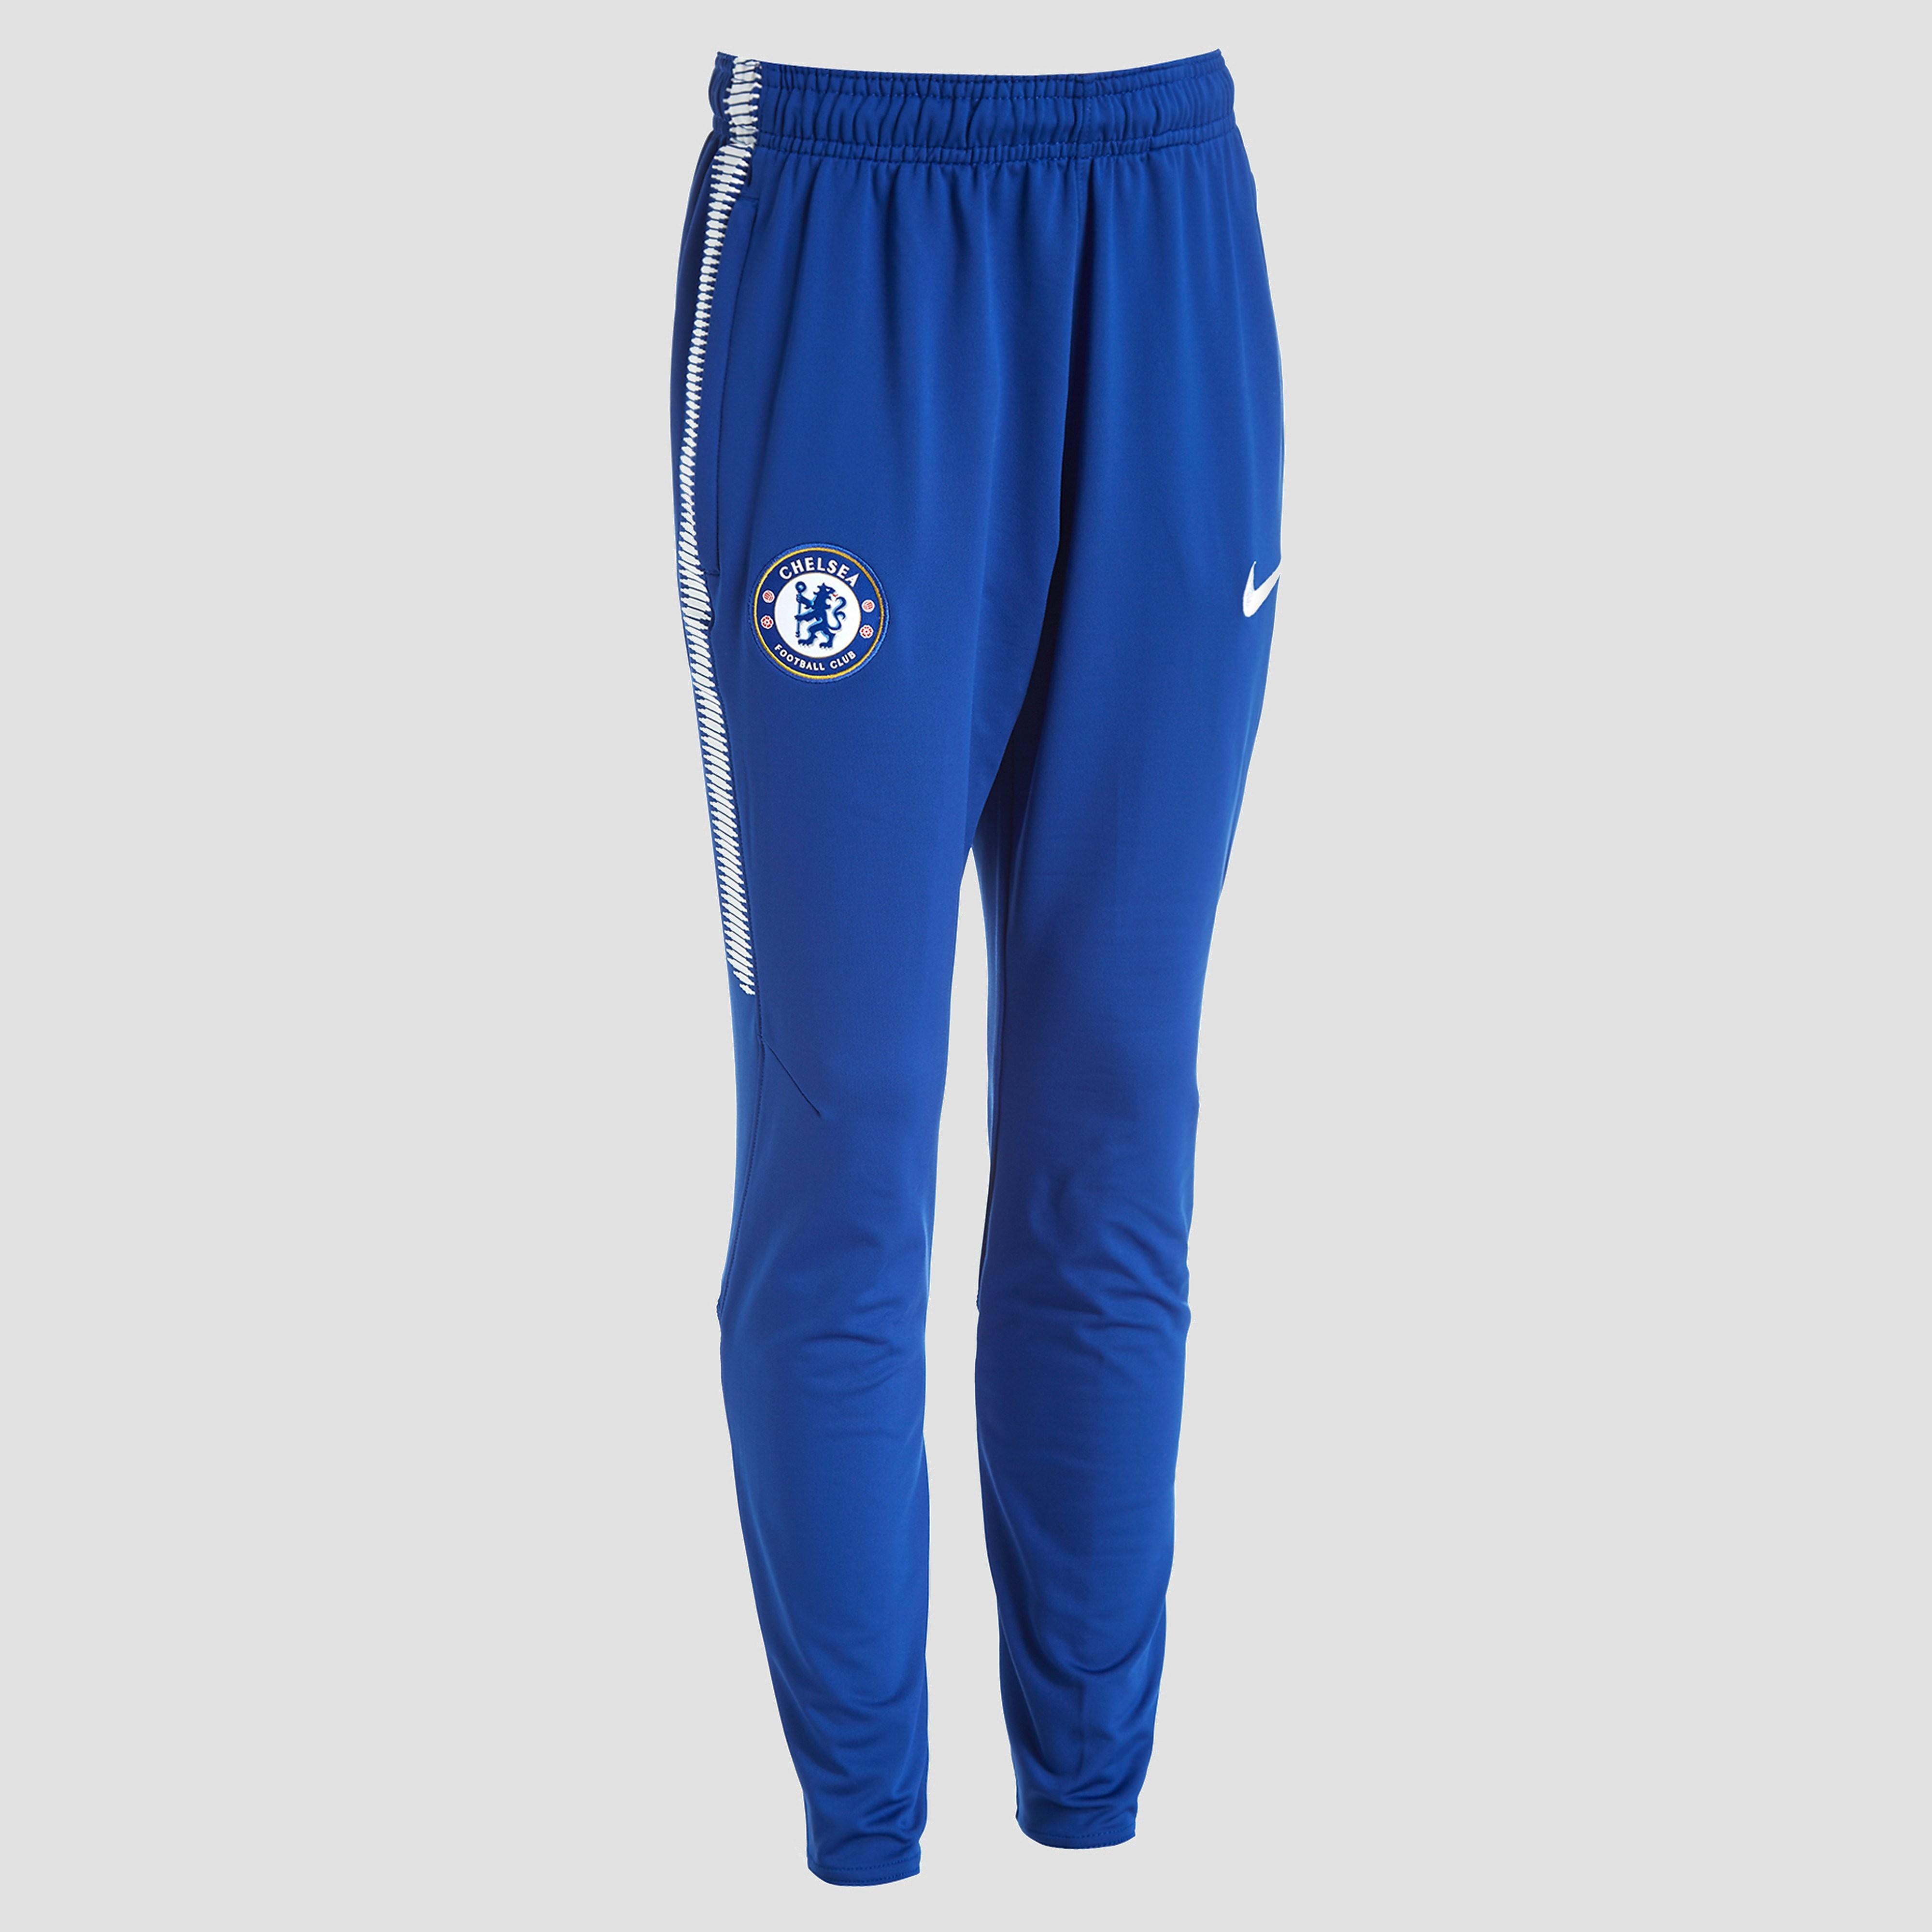 Nike Chelsea FC 2017/18 Squad Junior Football Pants